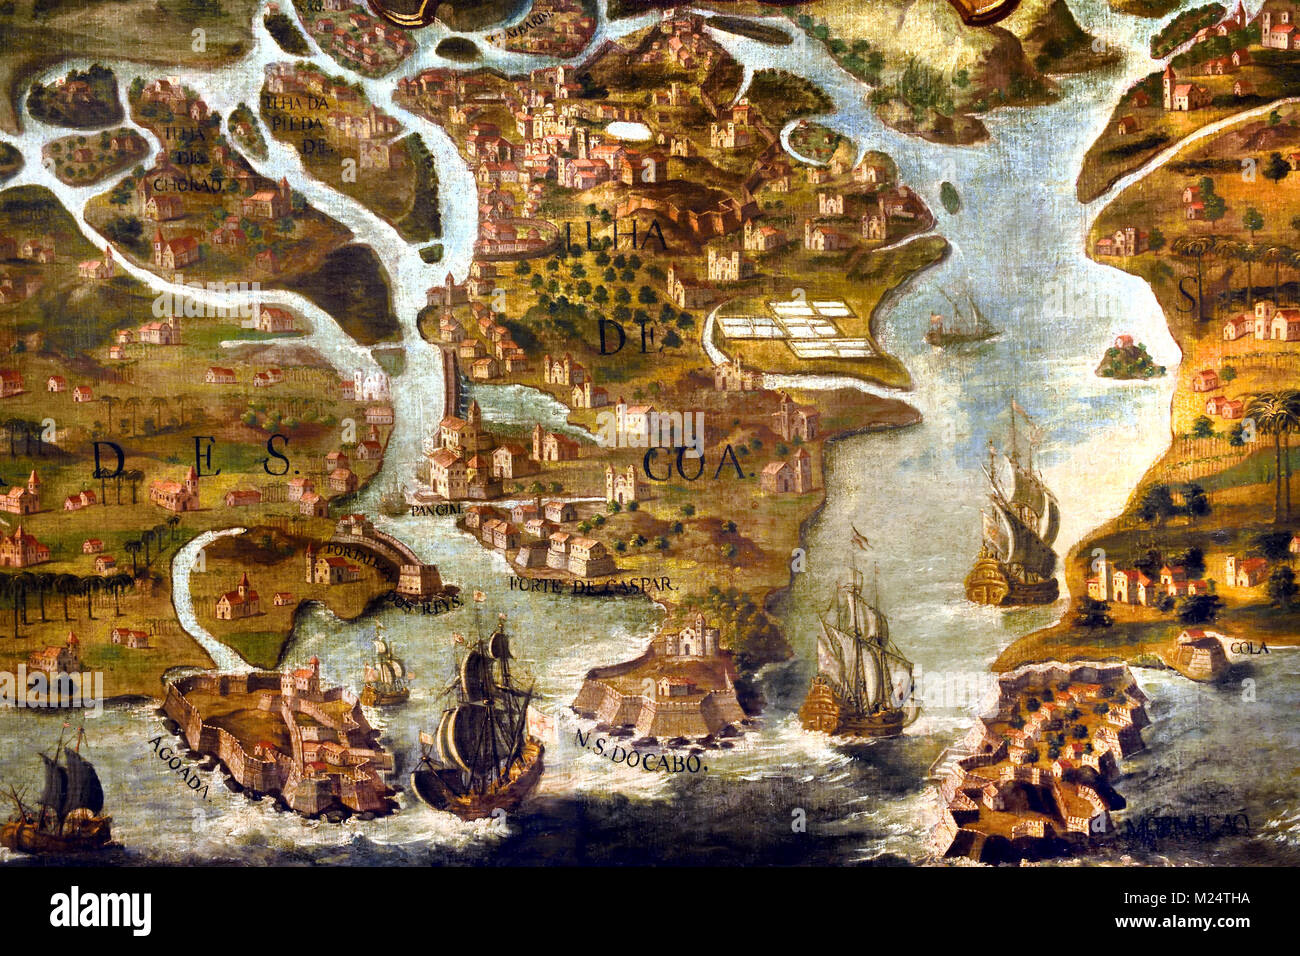 Map of Goa India 17th-century Portugal, Portuguese, - Stock Image